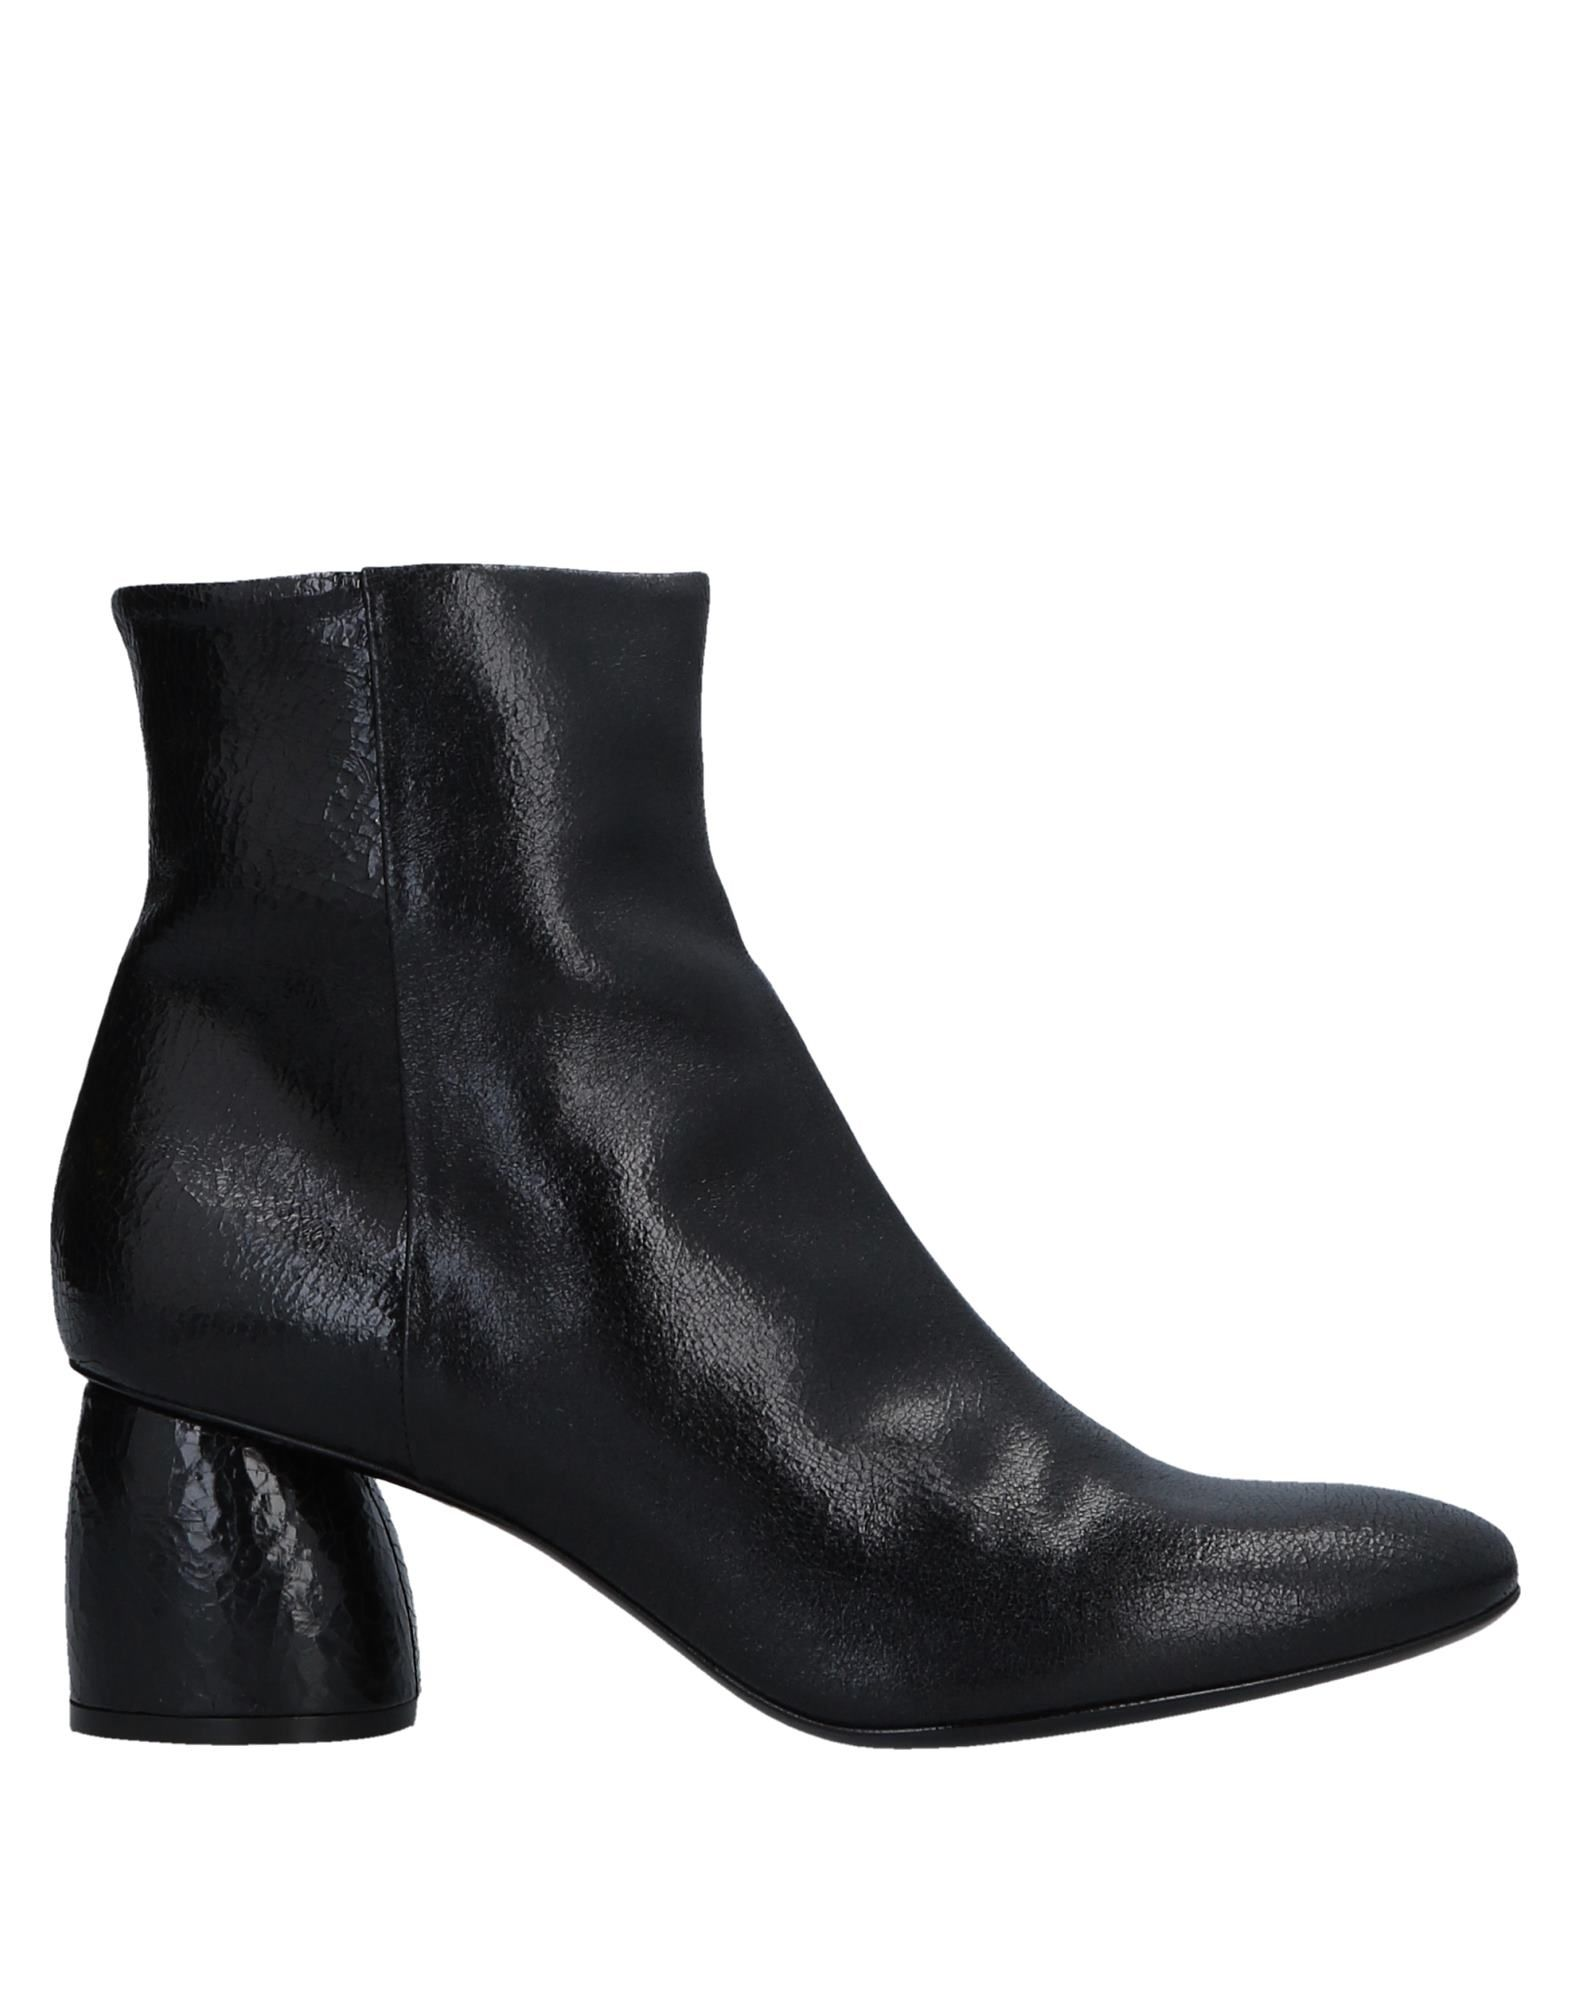 Elena Iachi Stiefelette Damen  11520886CEGut aussehende strapazierfähige Schuhe